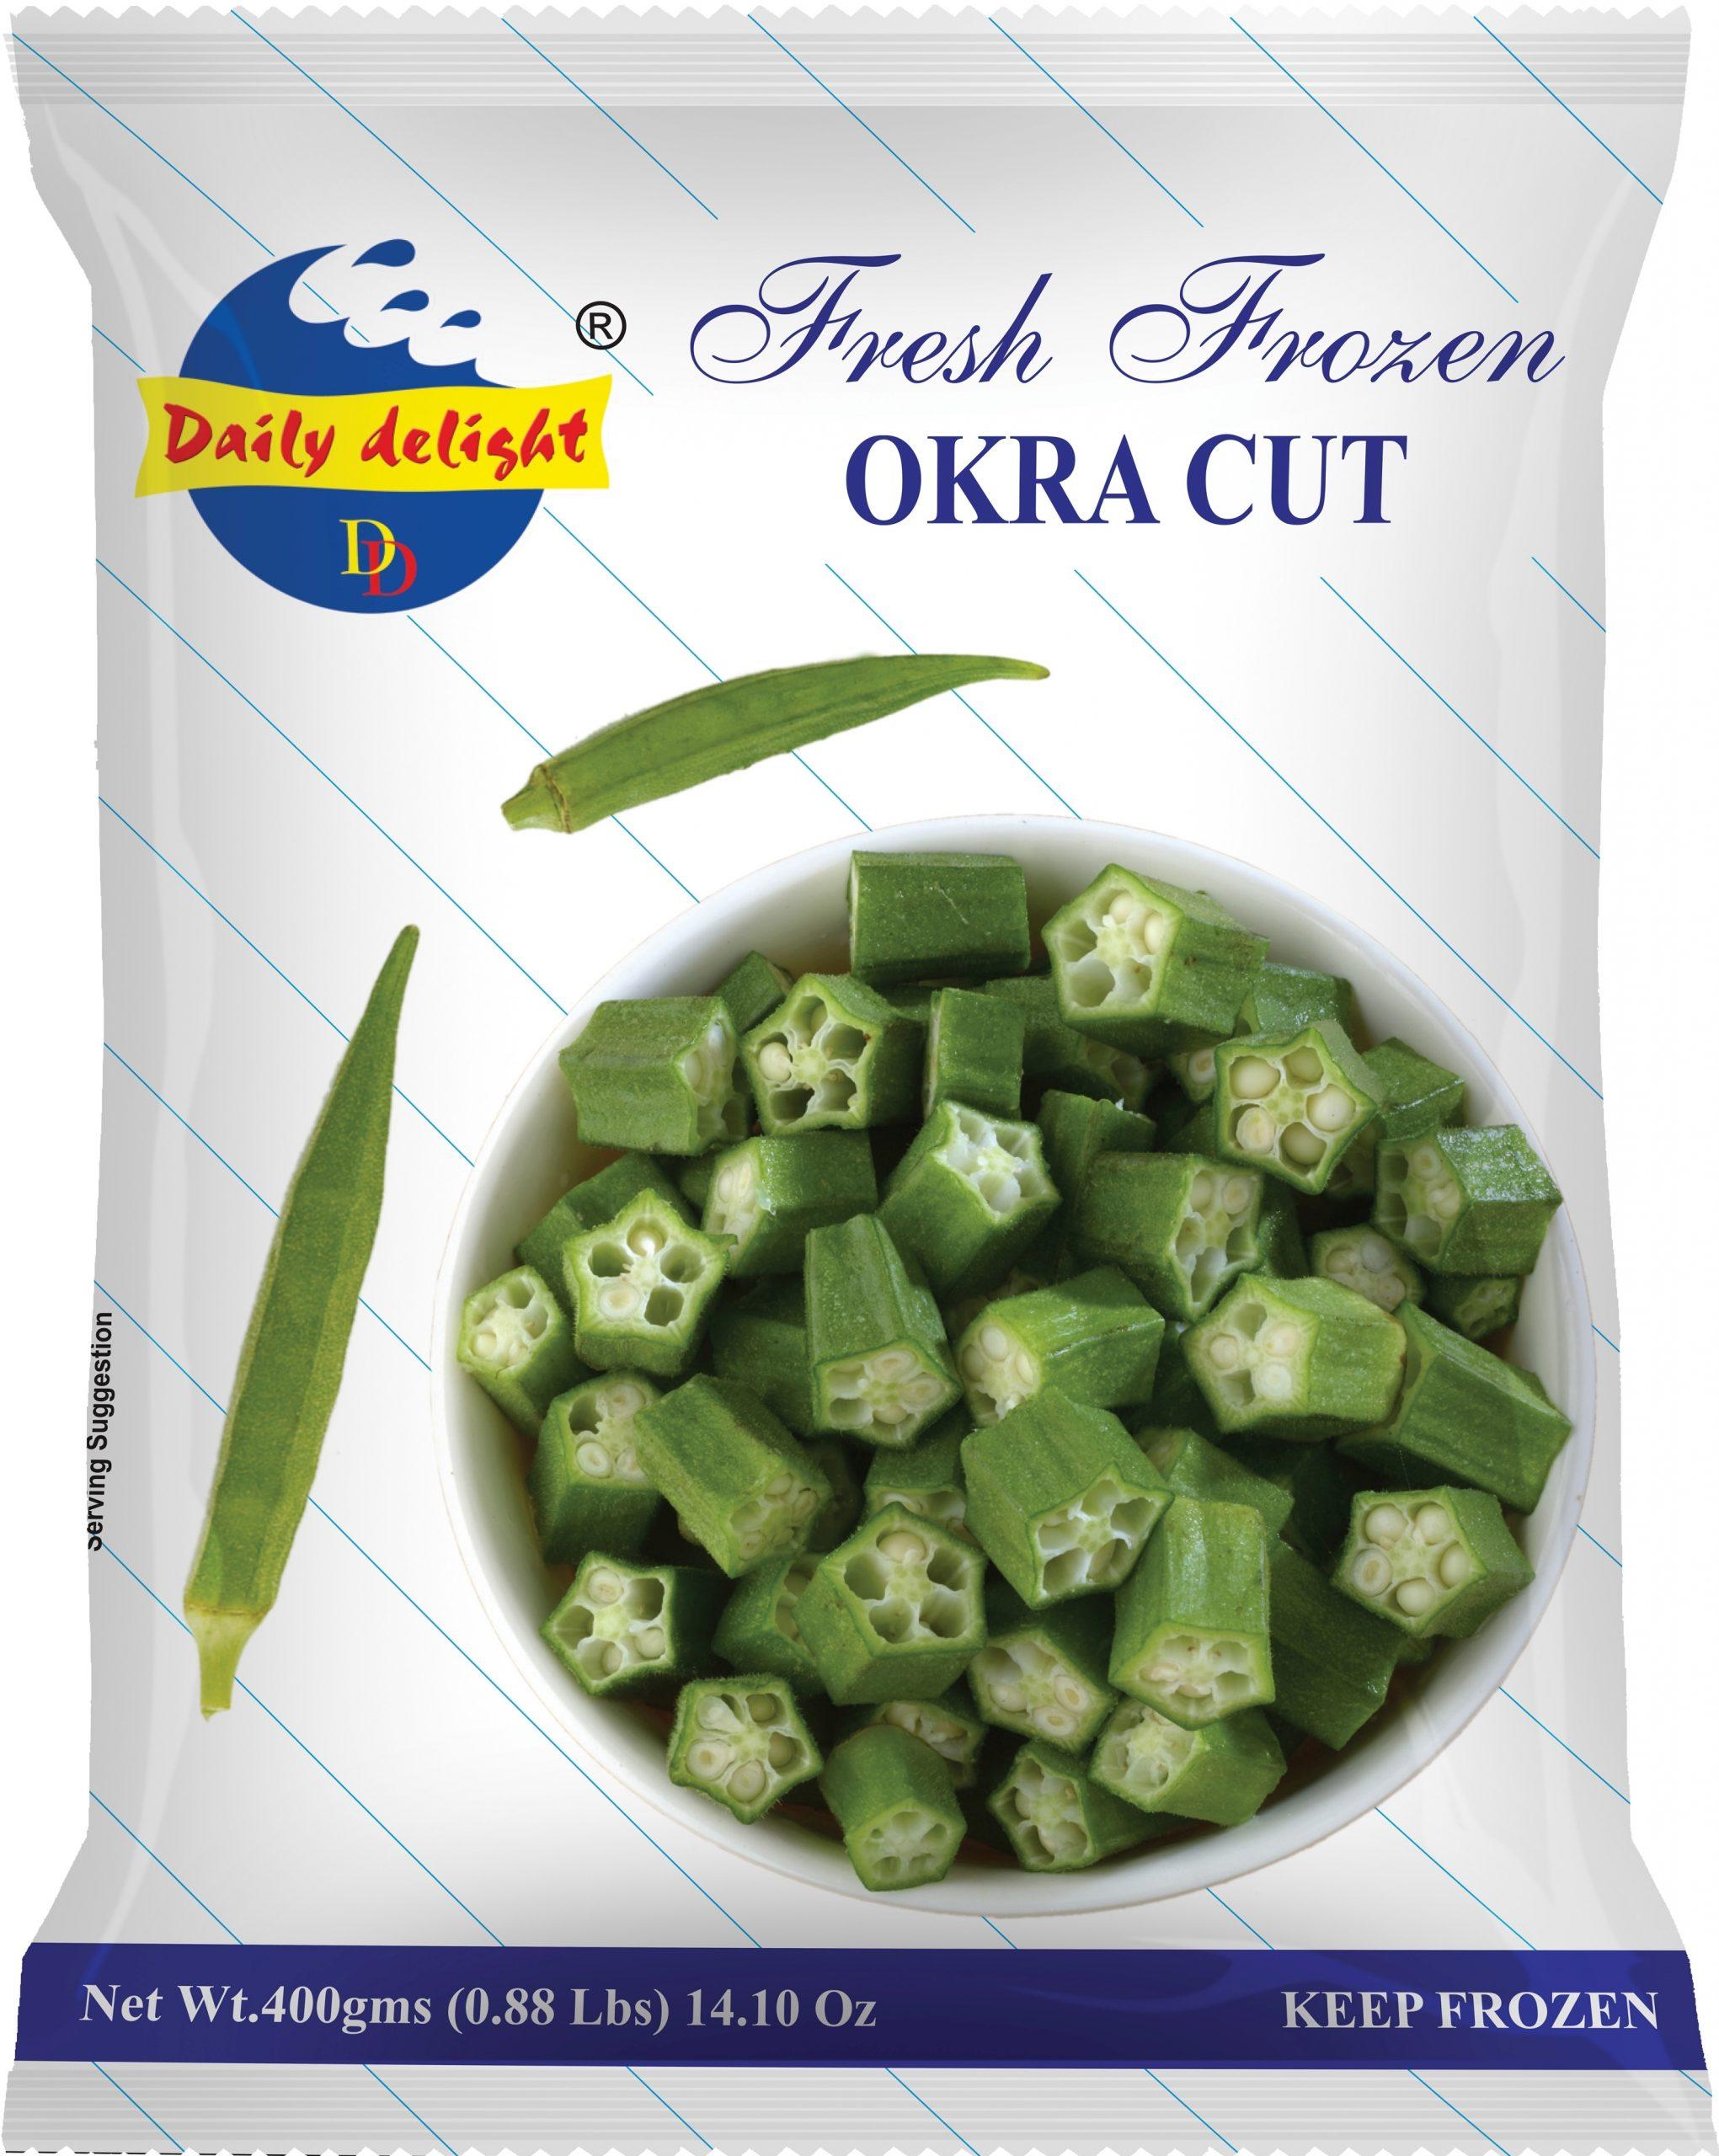 Daily Delight Okra Cut